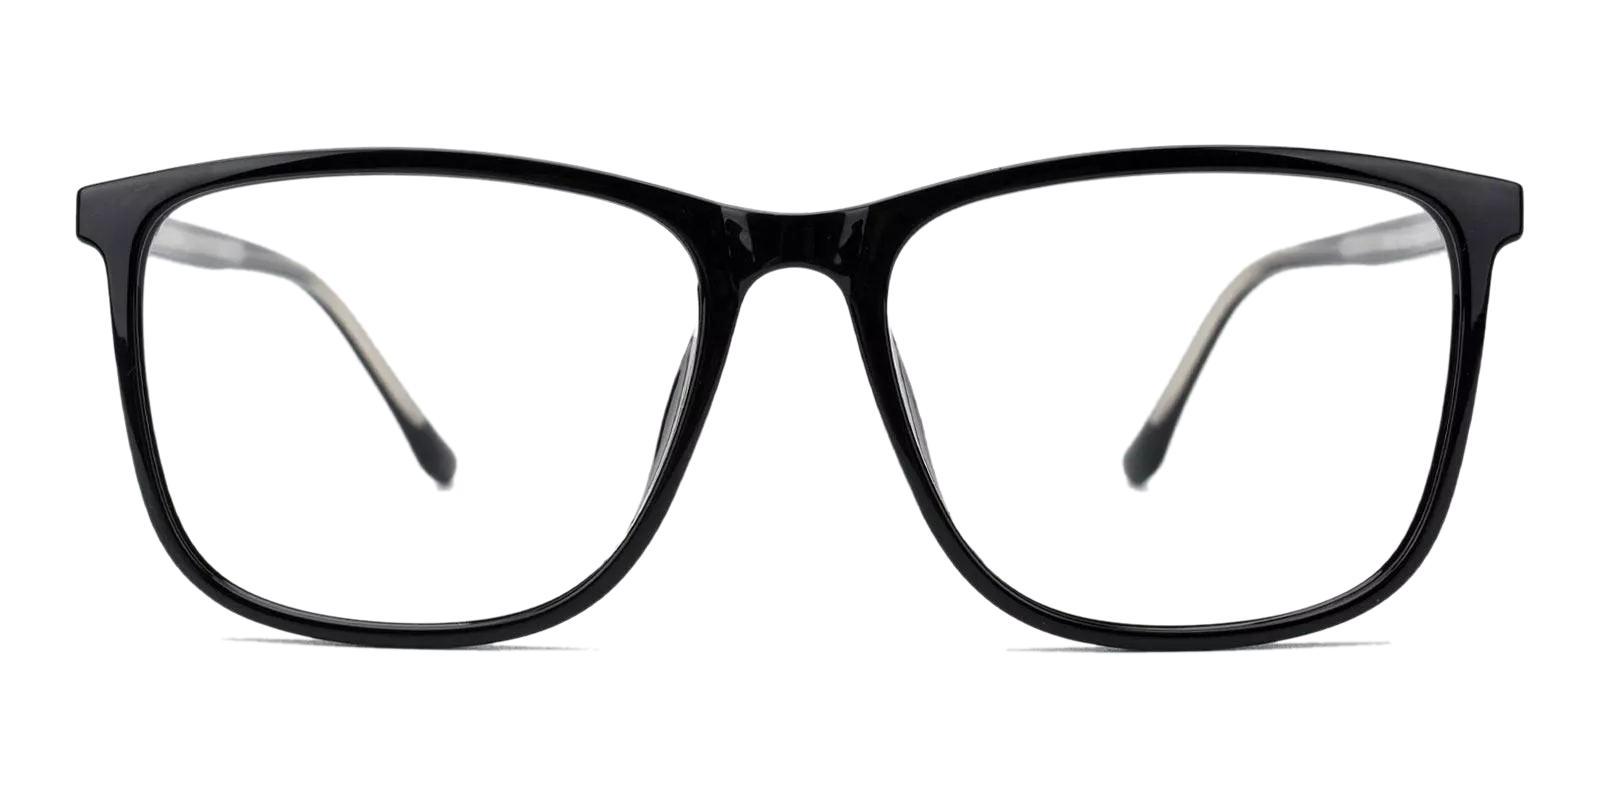 Abazam Black TR Eyeglasses , Fashion , UniversalBridgeFit Frames from ABBE Glasses